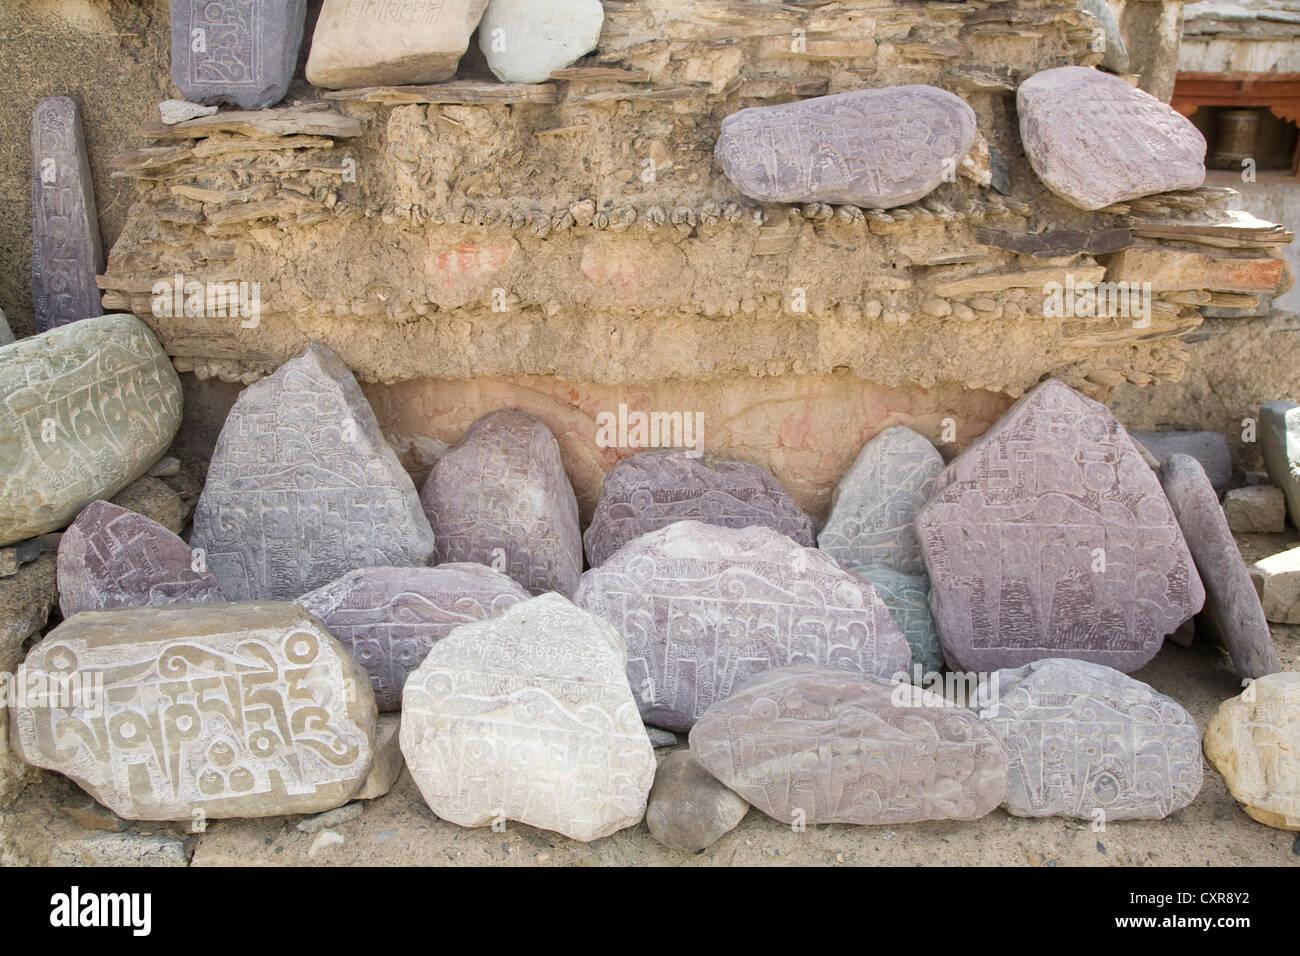 Prière Mani pierres dans l'Himalaya indien. Photo Stock